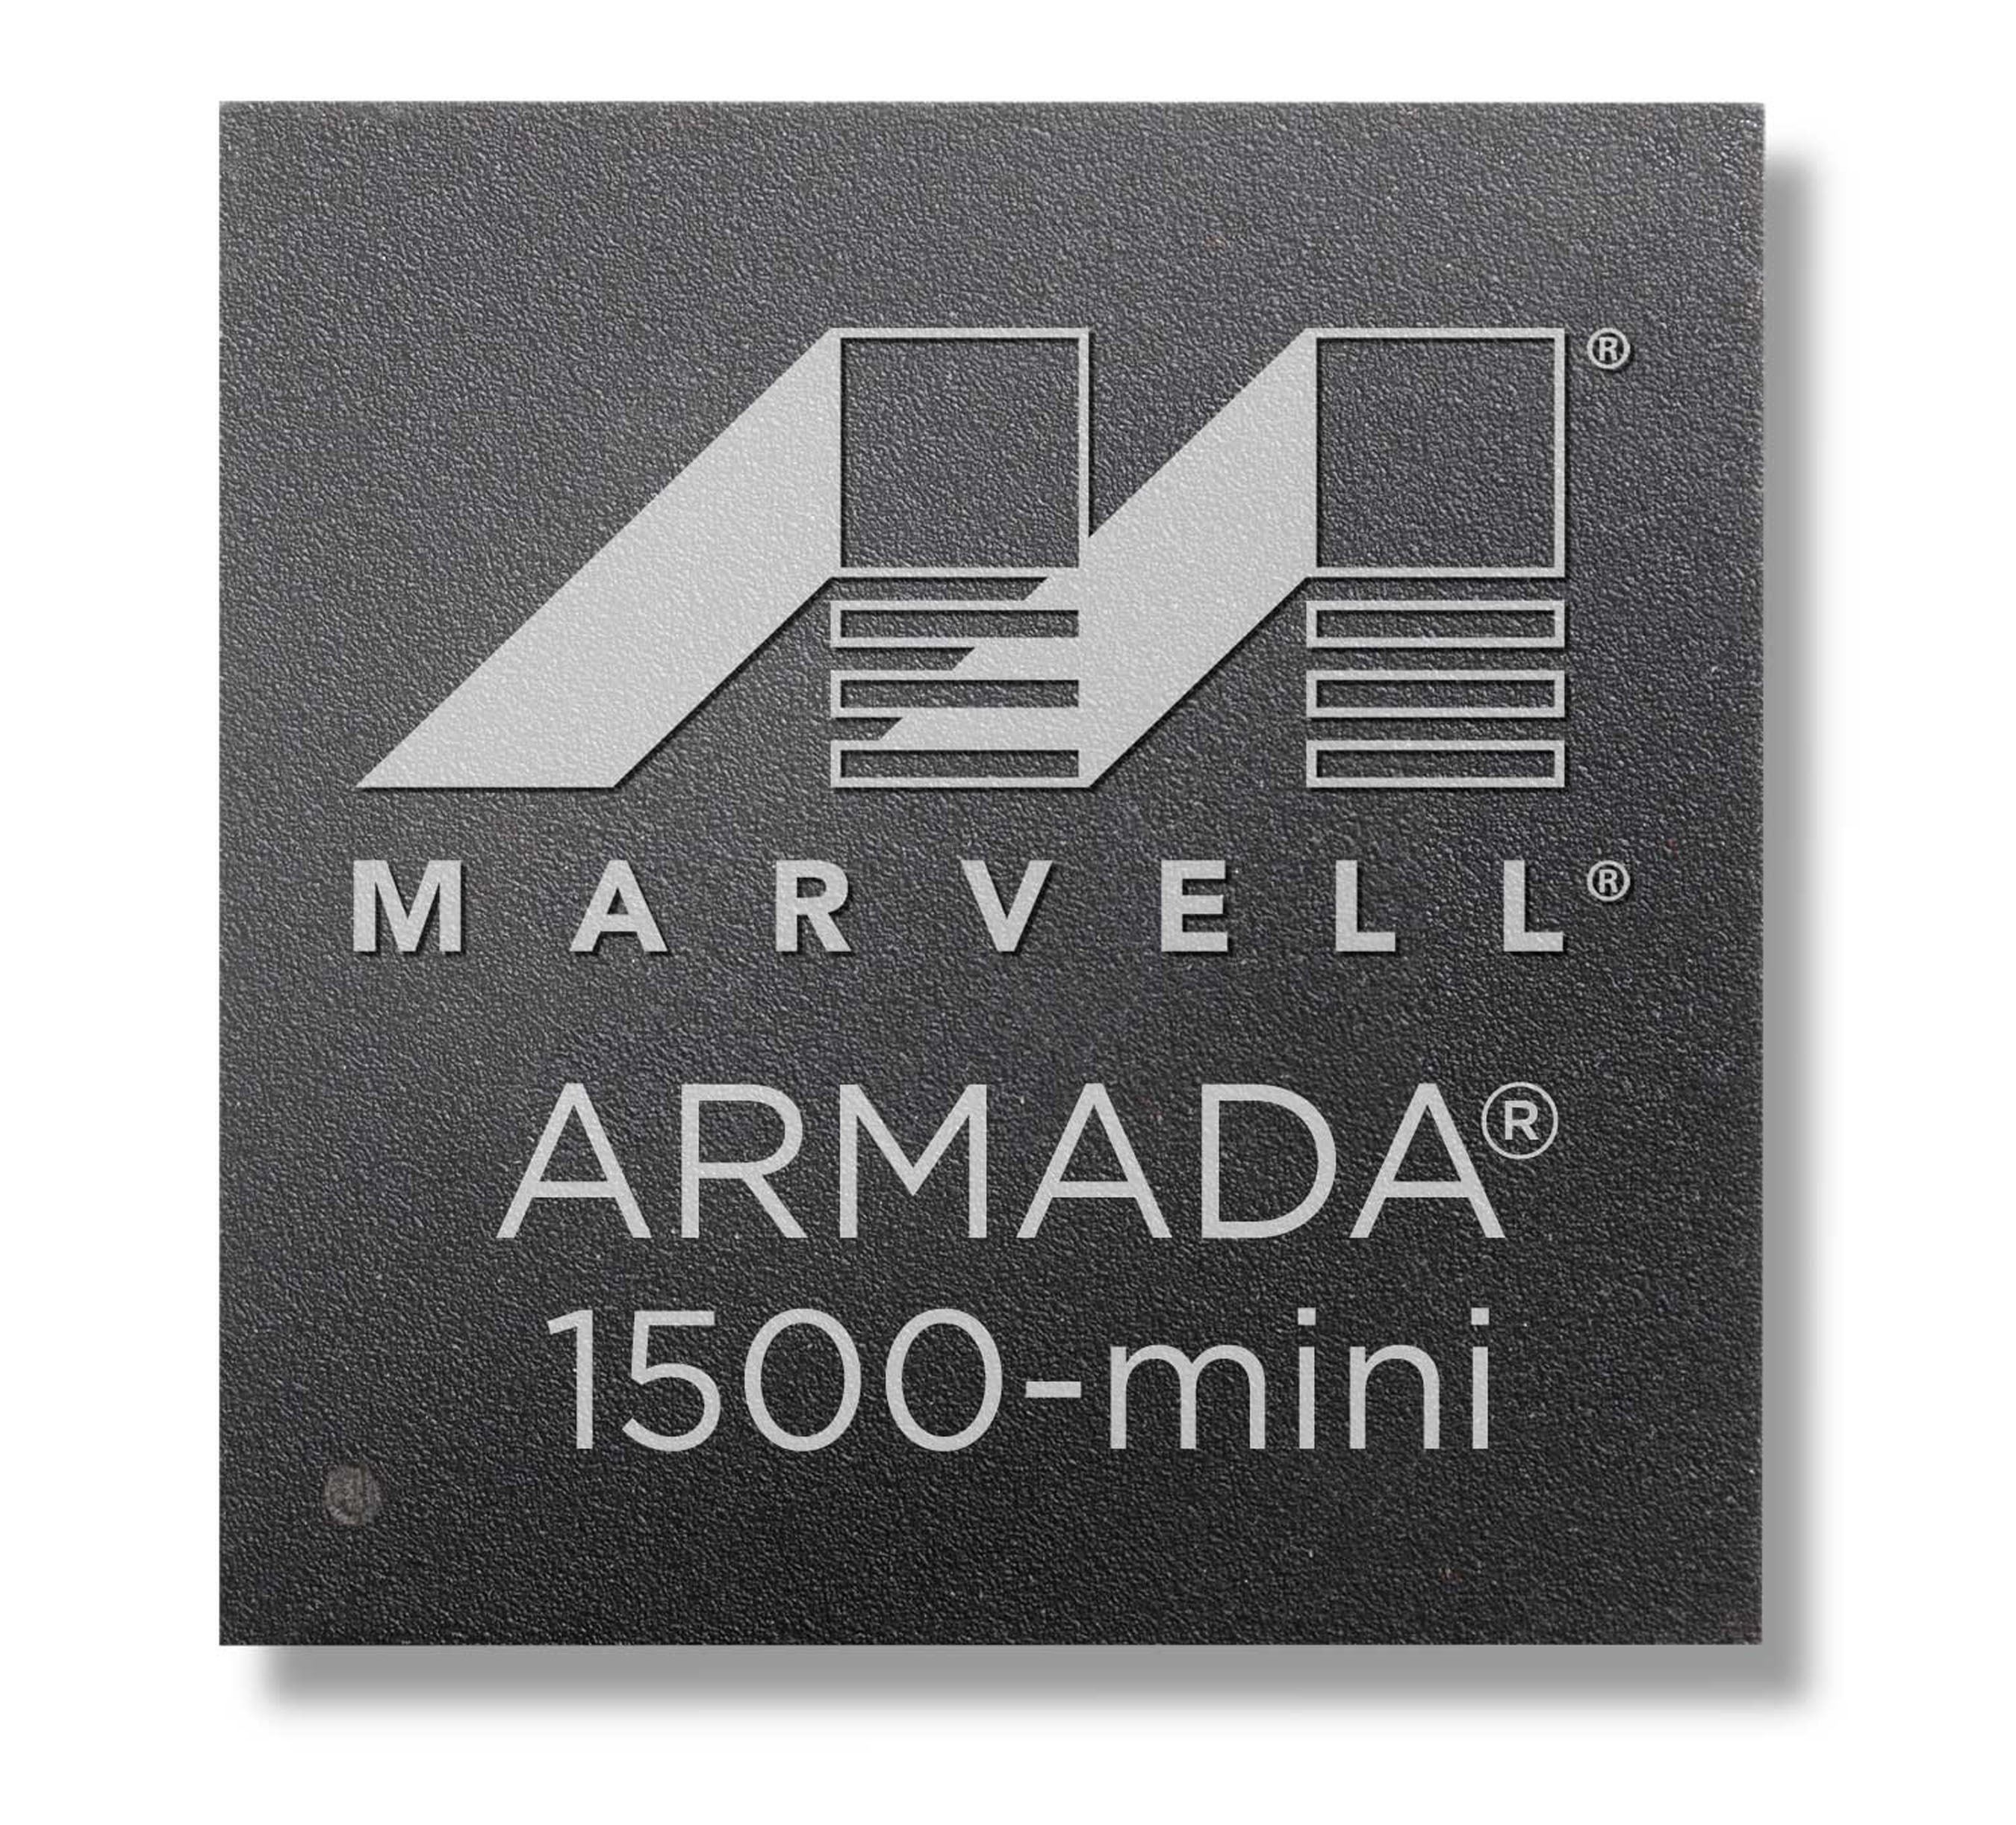 Marvell Unveils Game-Changing ARMADA 1500-mini Solution for Chromecast. (PRNewsFoto/Marvell) (PRNewsFoto/)